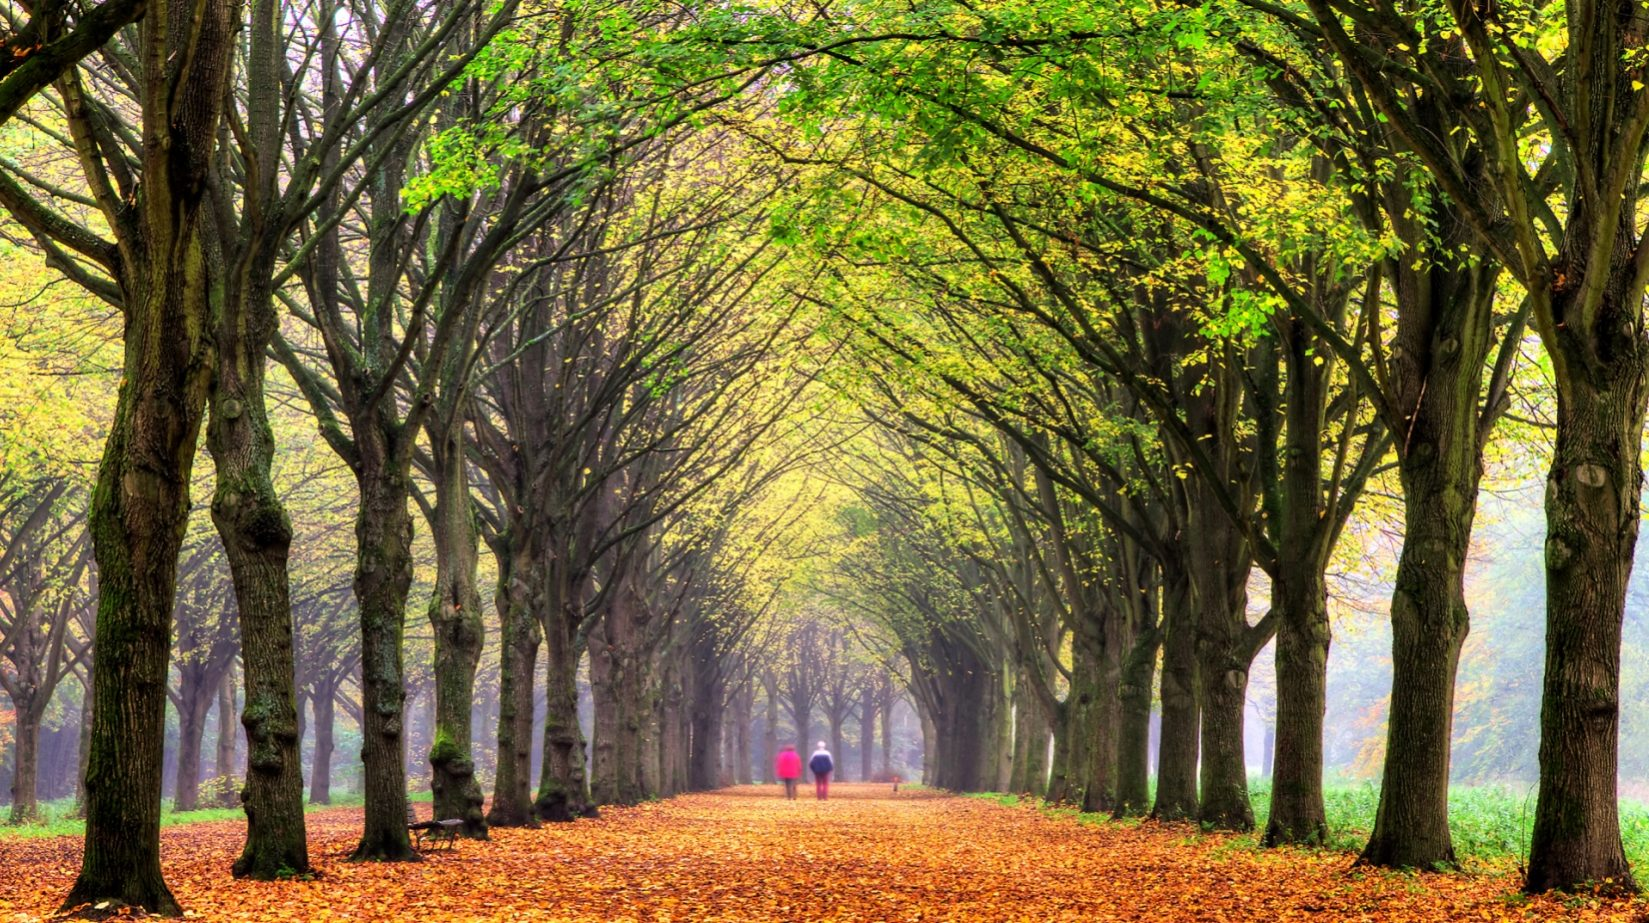 People walking along tree lined path